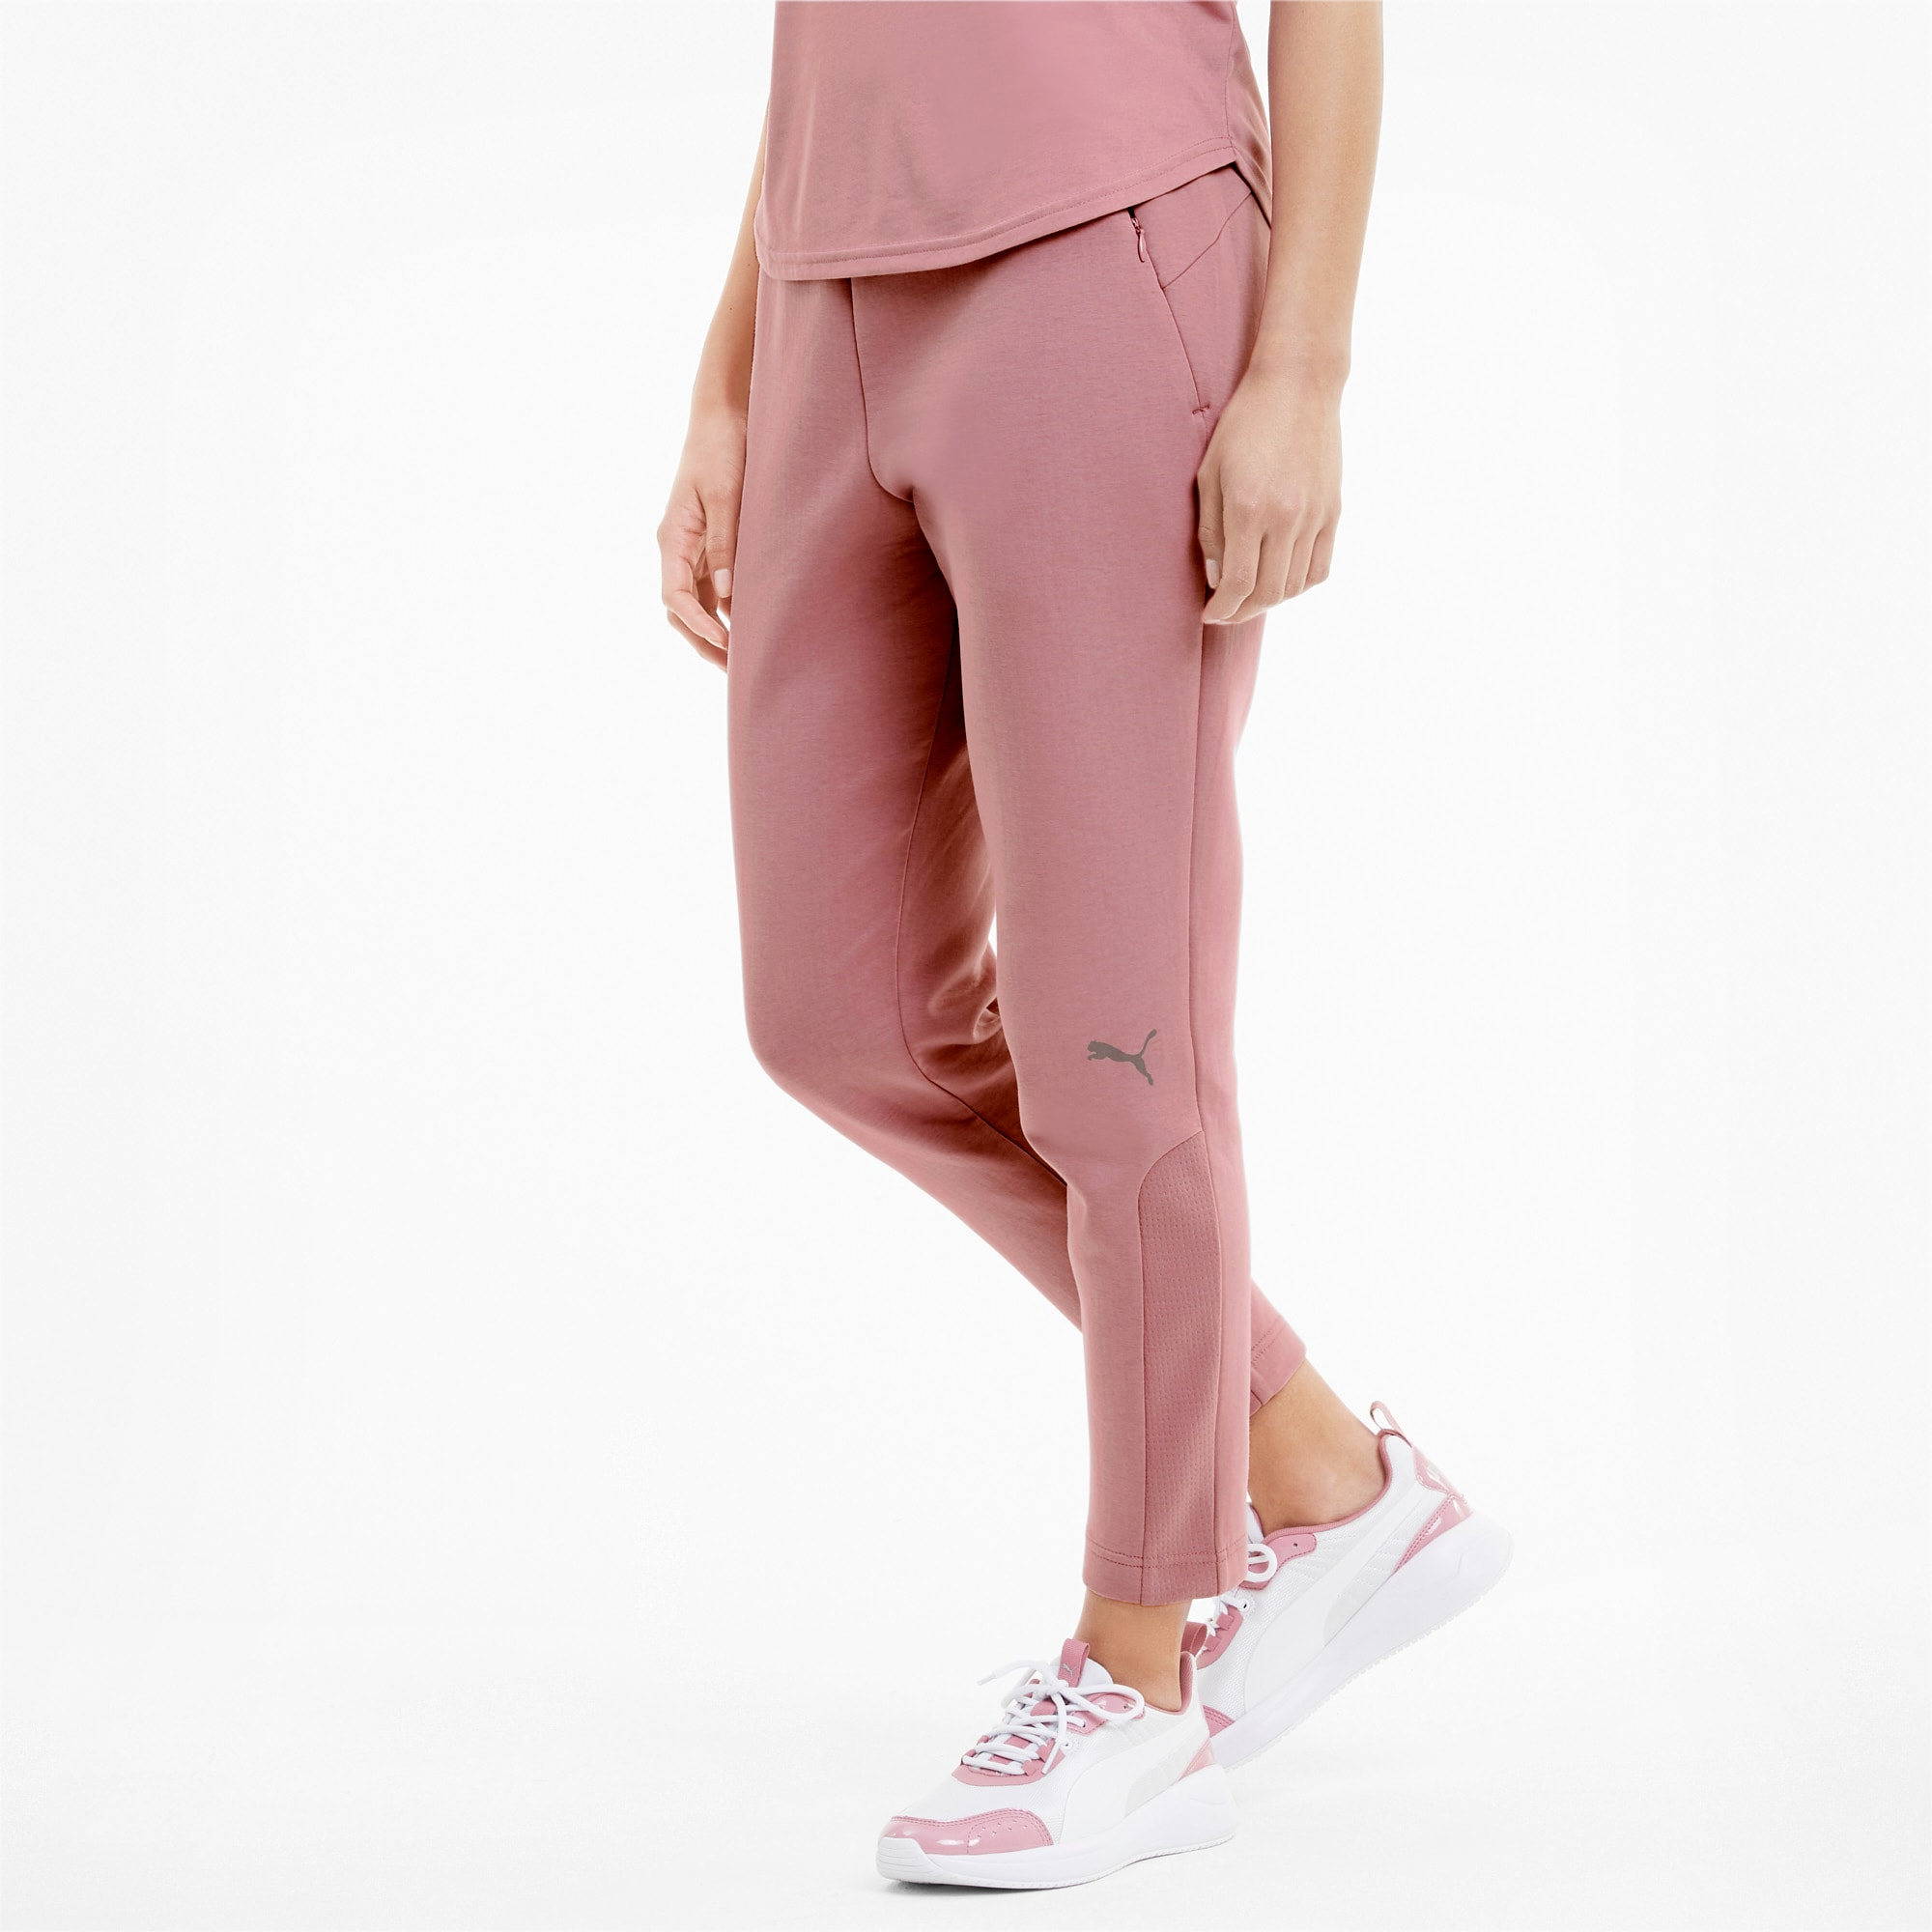 Pantalon en sweat Evostripe en maille pour femme